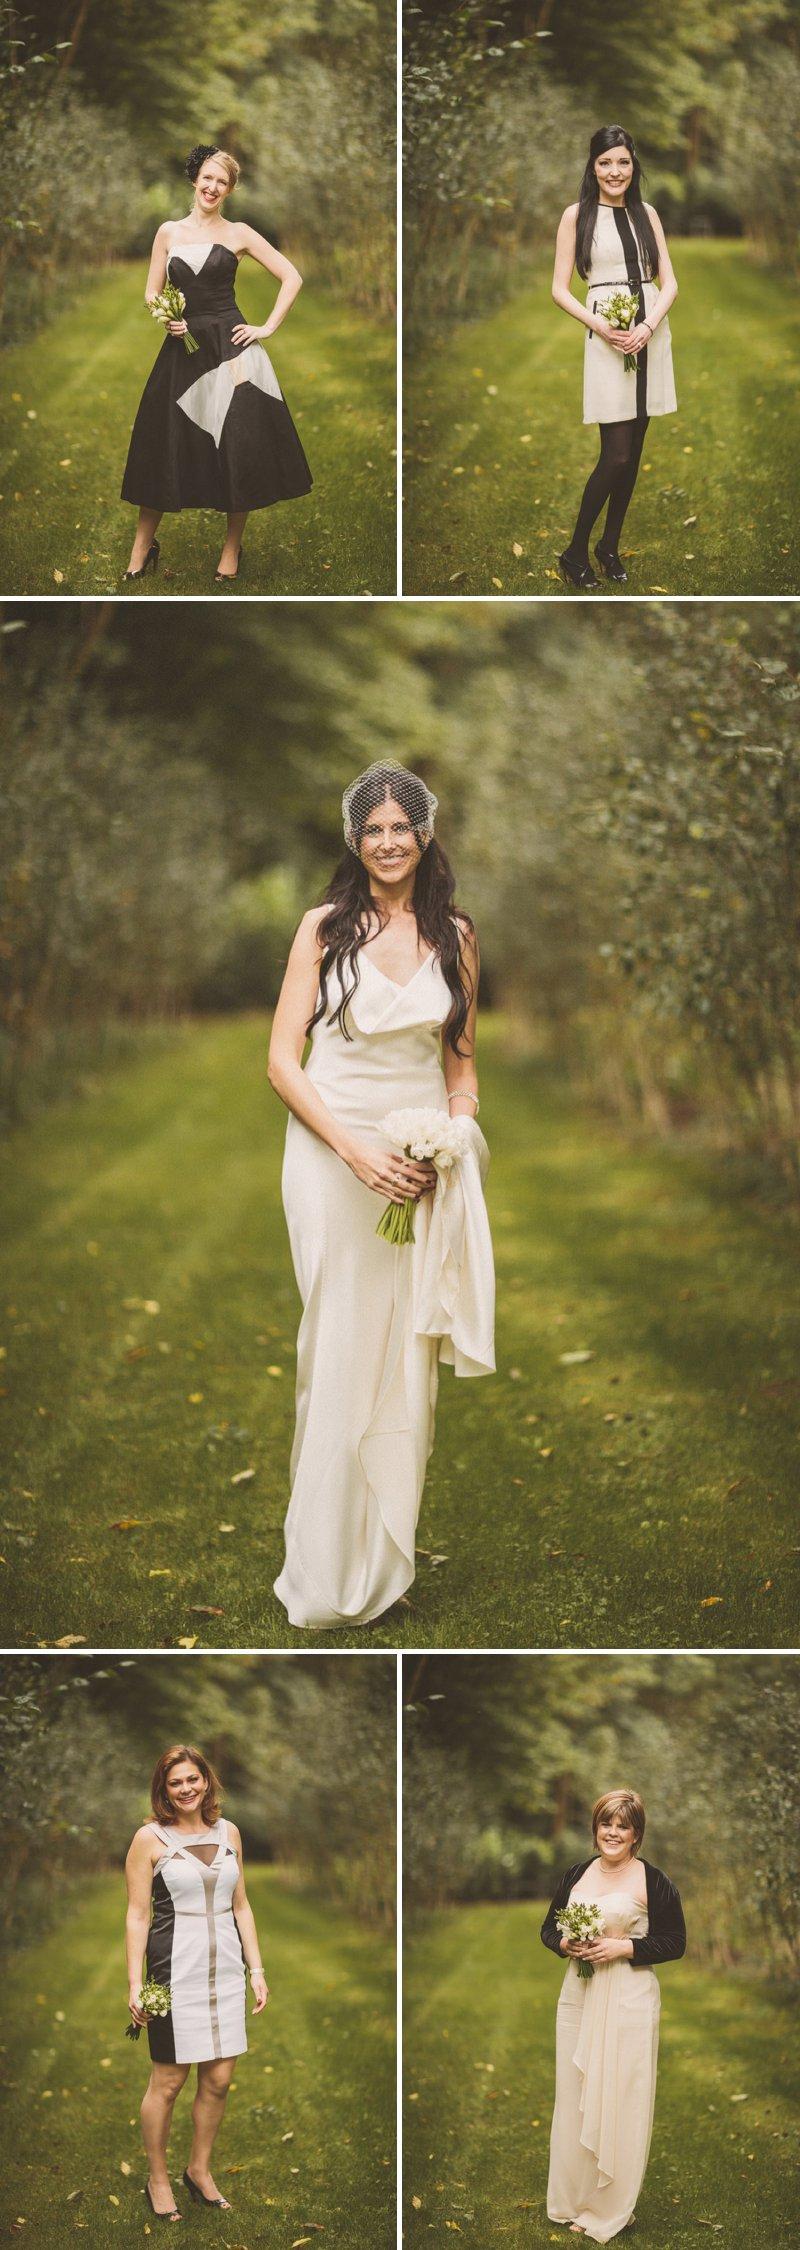 A blushing bride